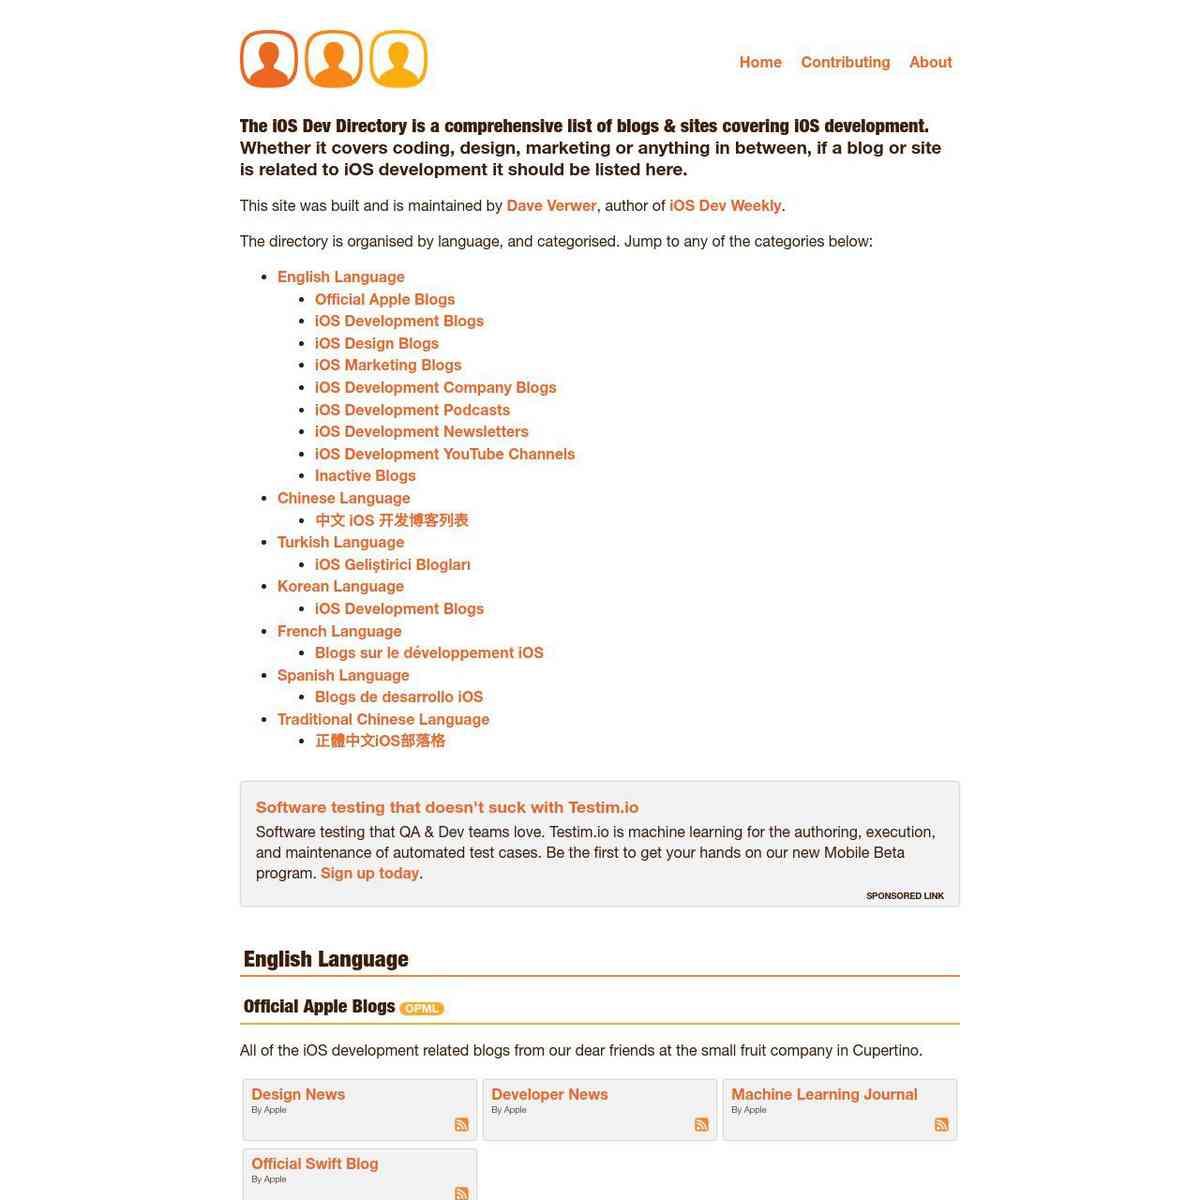 iOS Dev Directory: a comprehensive list of blogs & sites covering iOS development, design, marketing